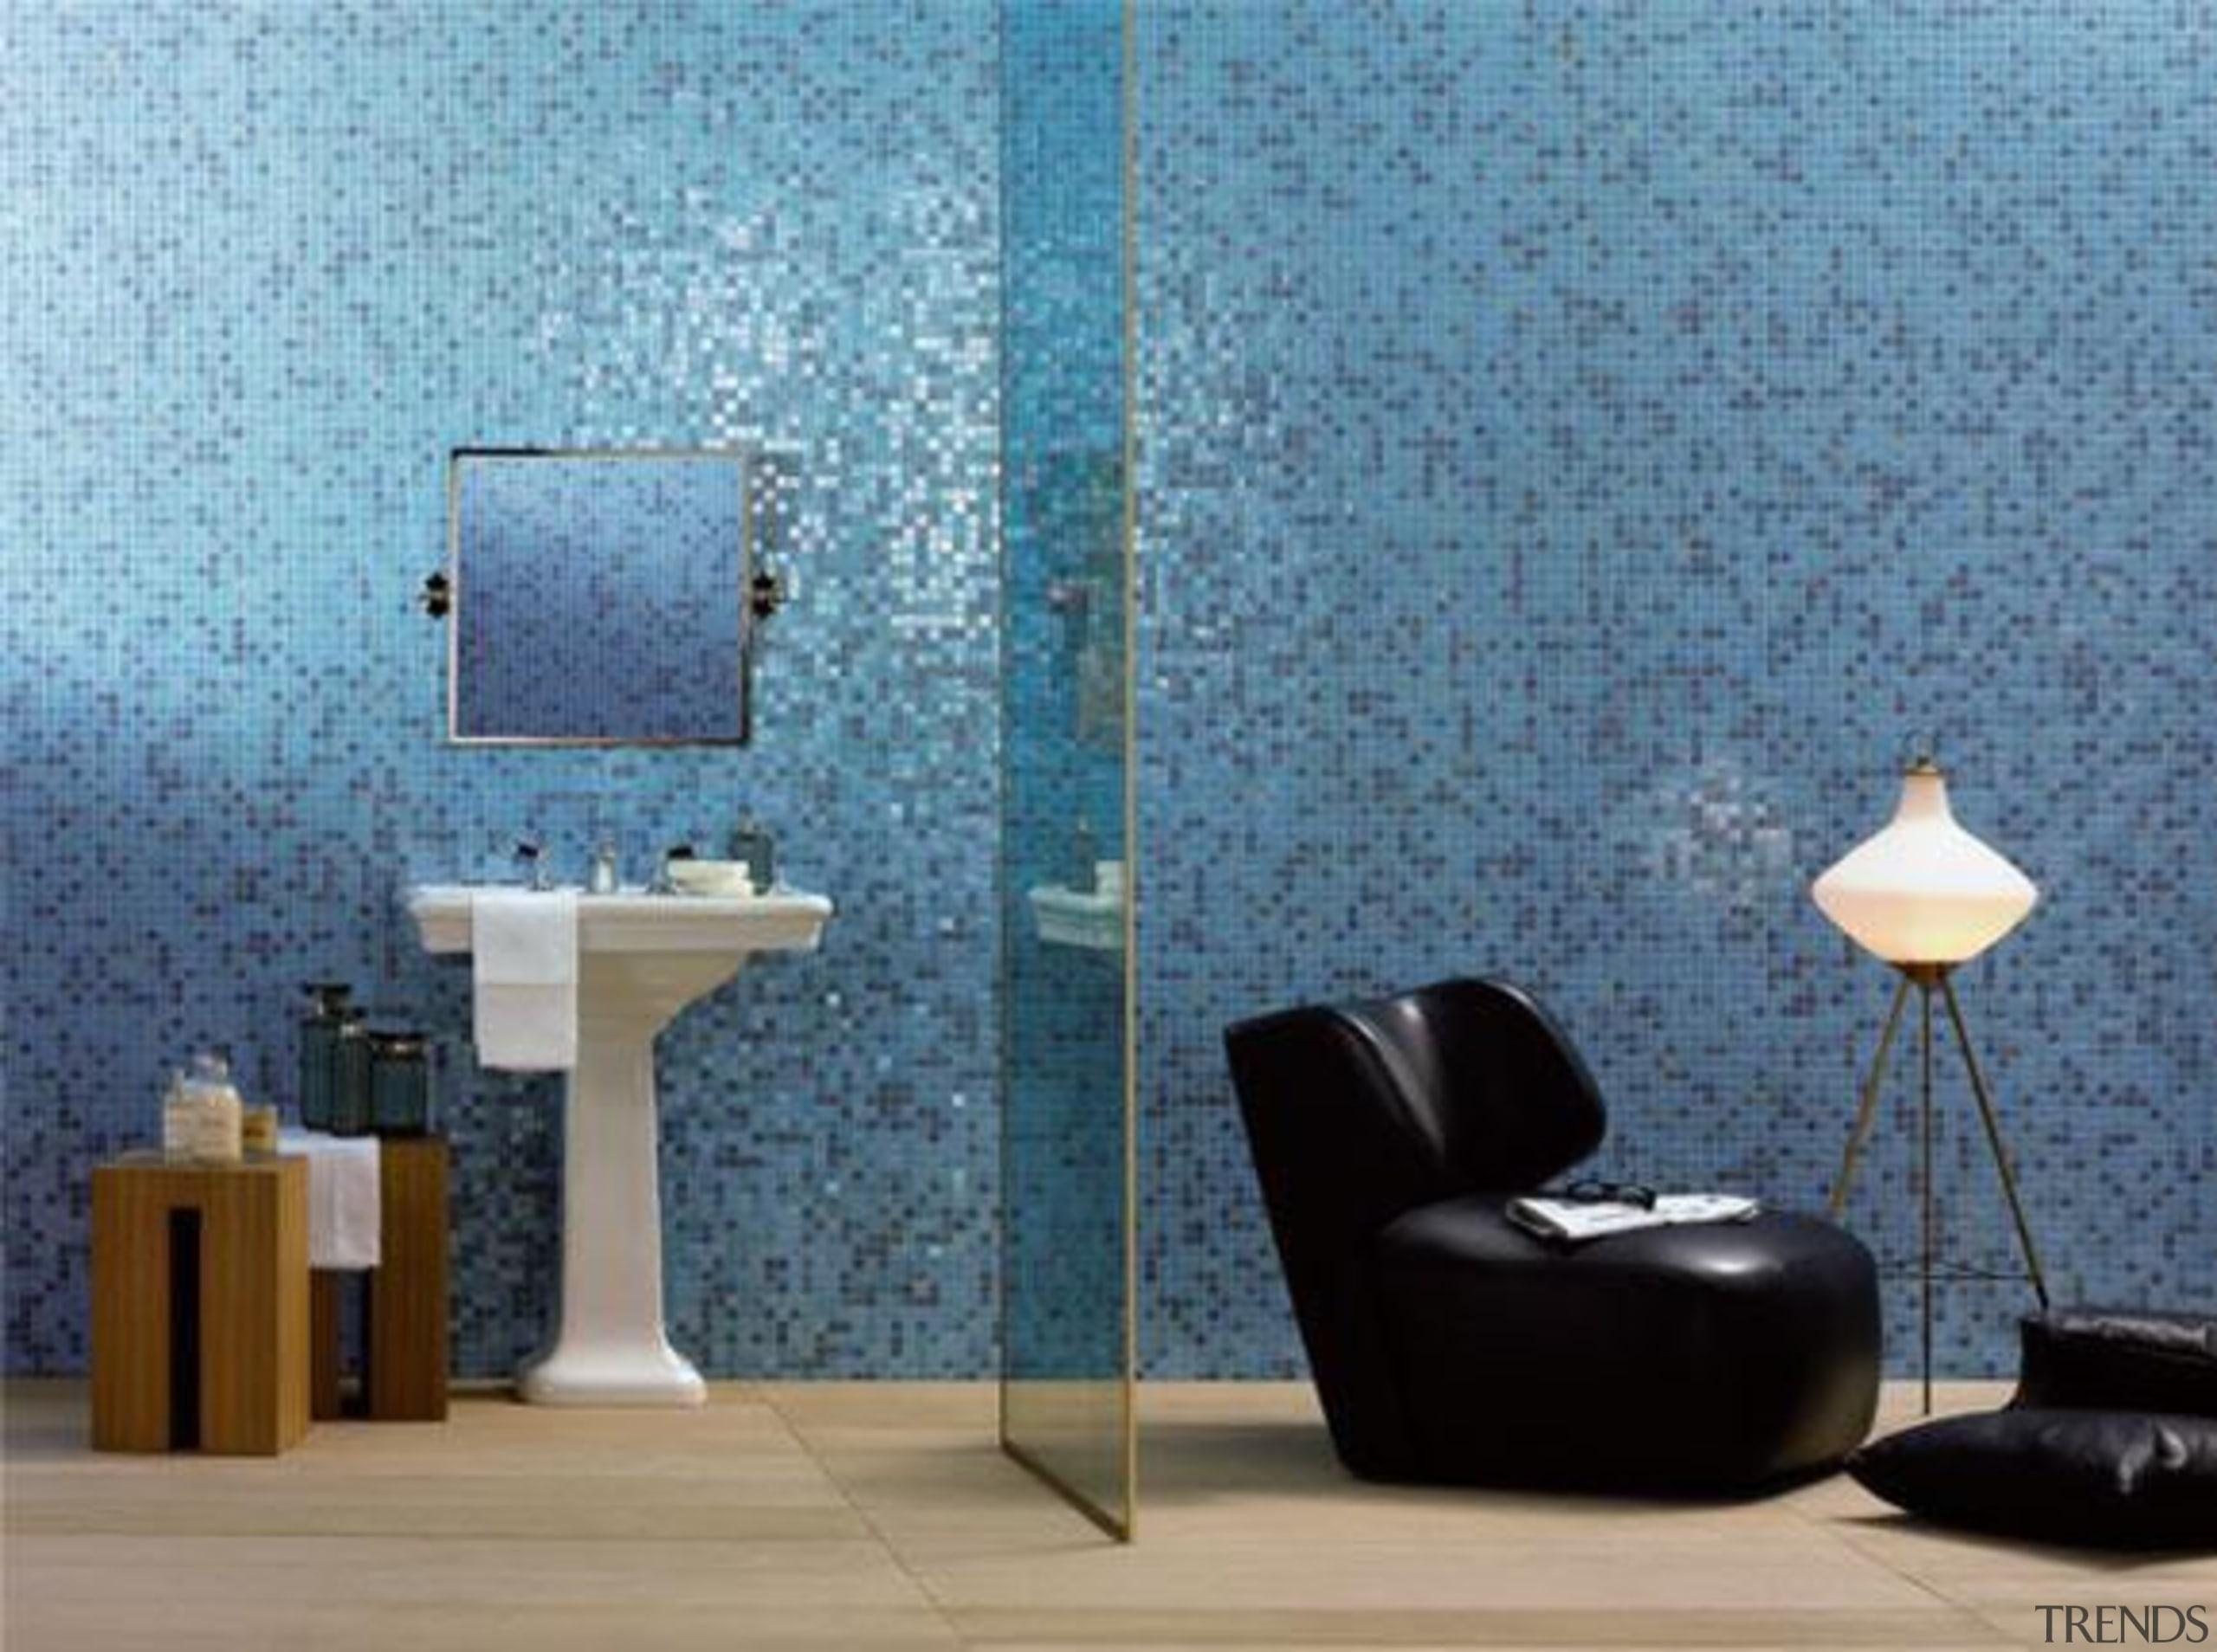 Sophia mosaic wall. - Bisazza Range - blue blue, floor, flooring, interior design, product design, tile, wall, wallpaper, teal